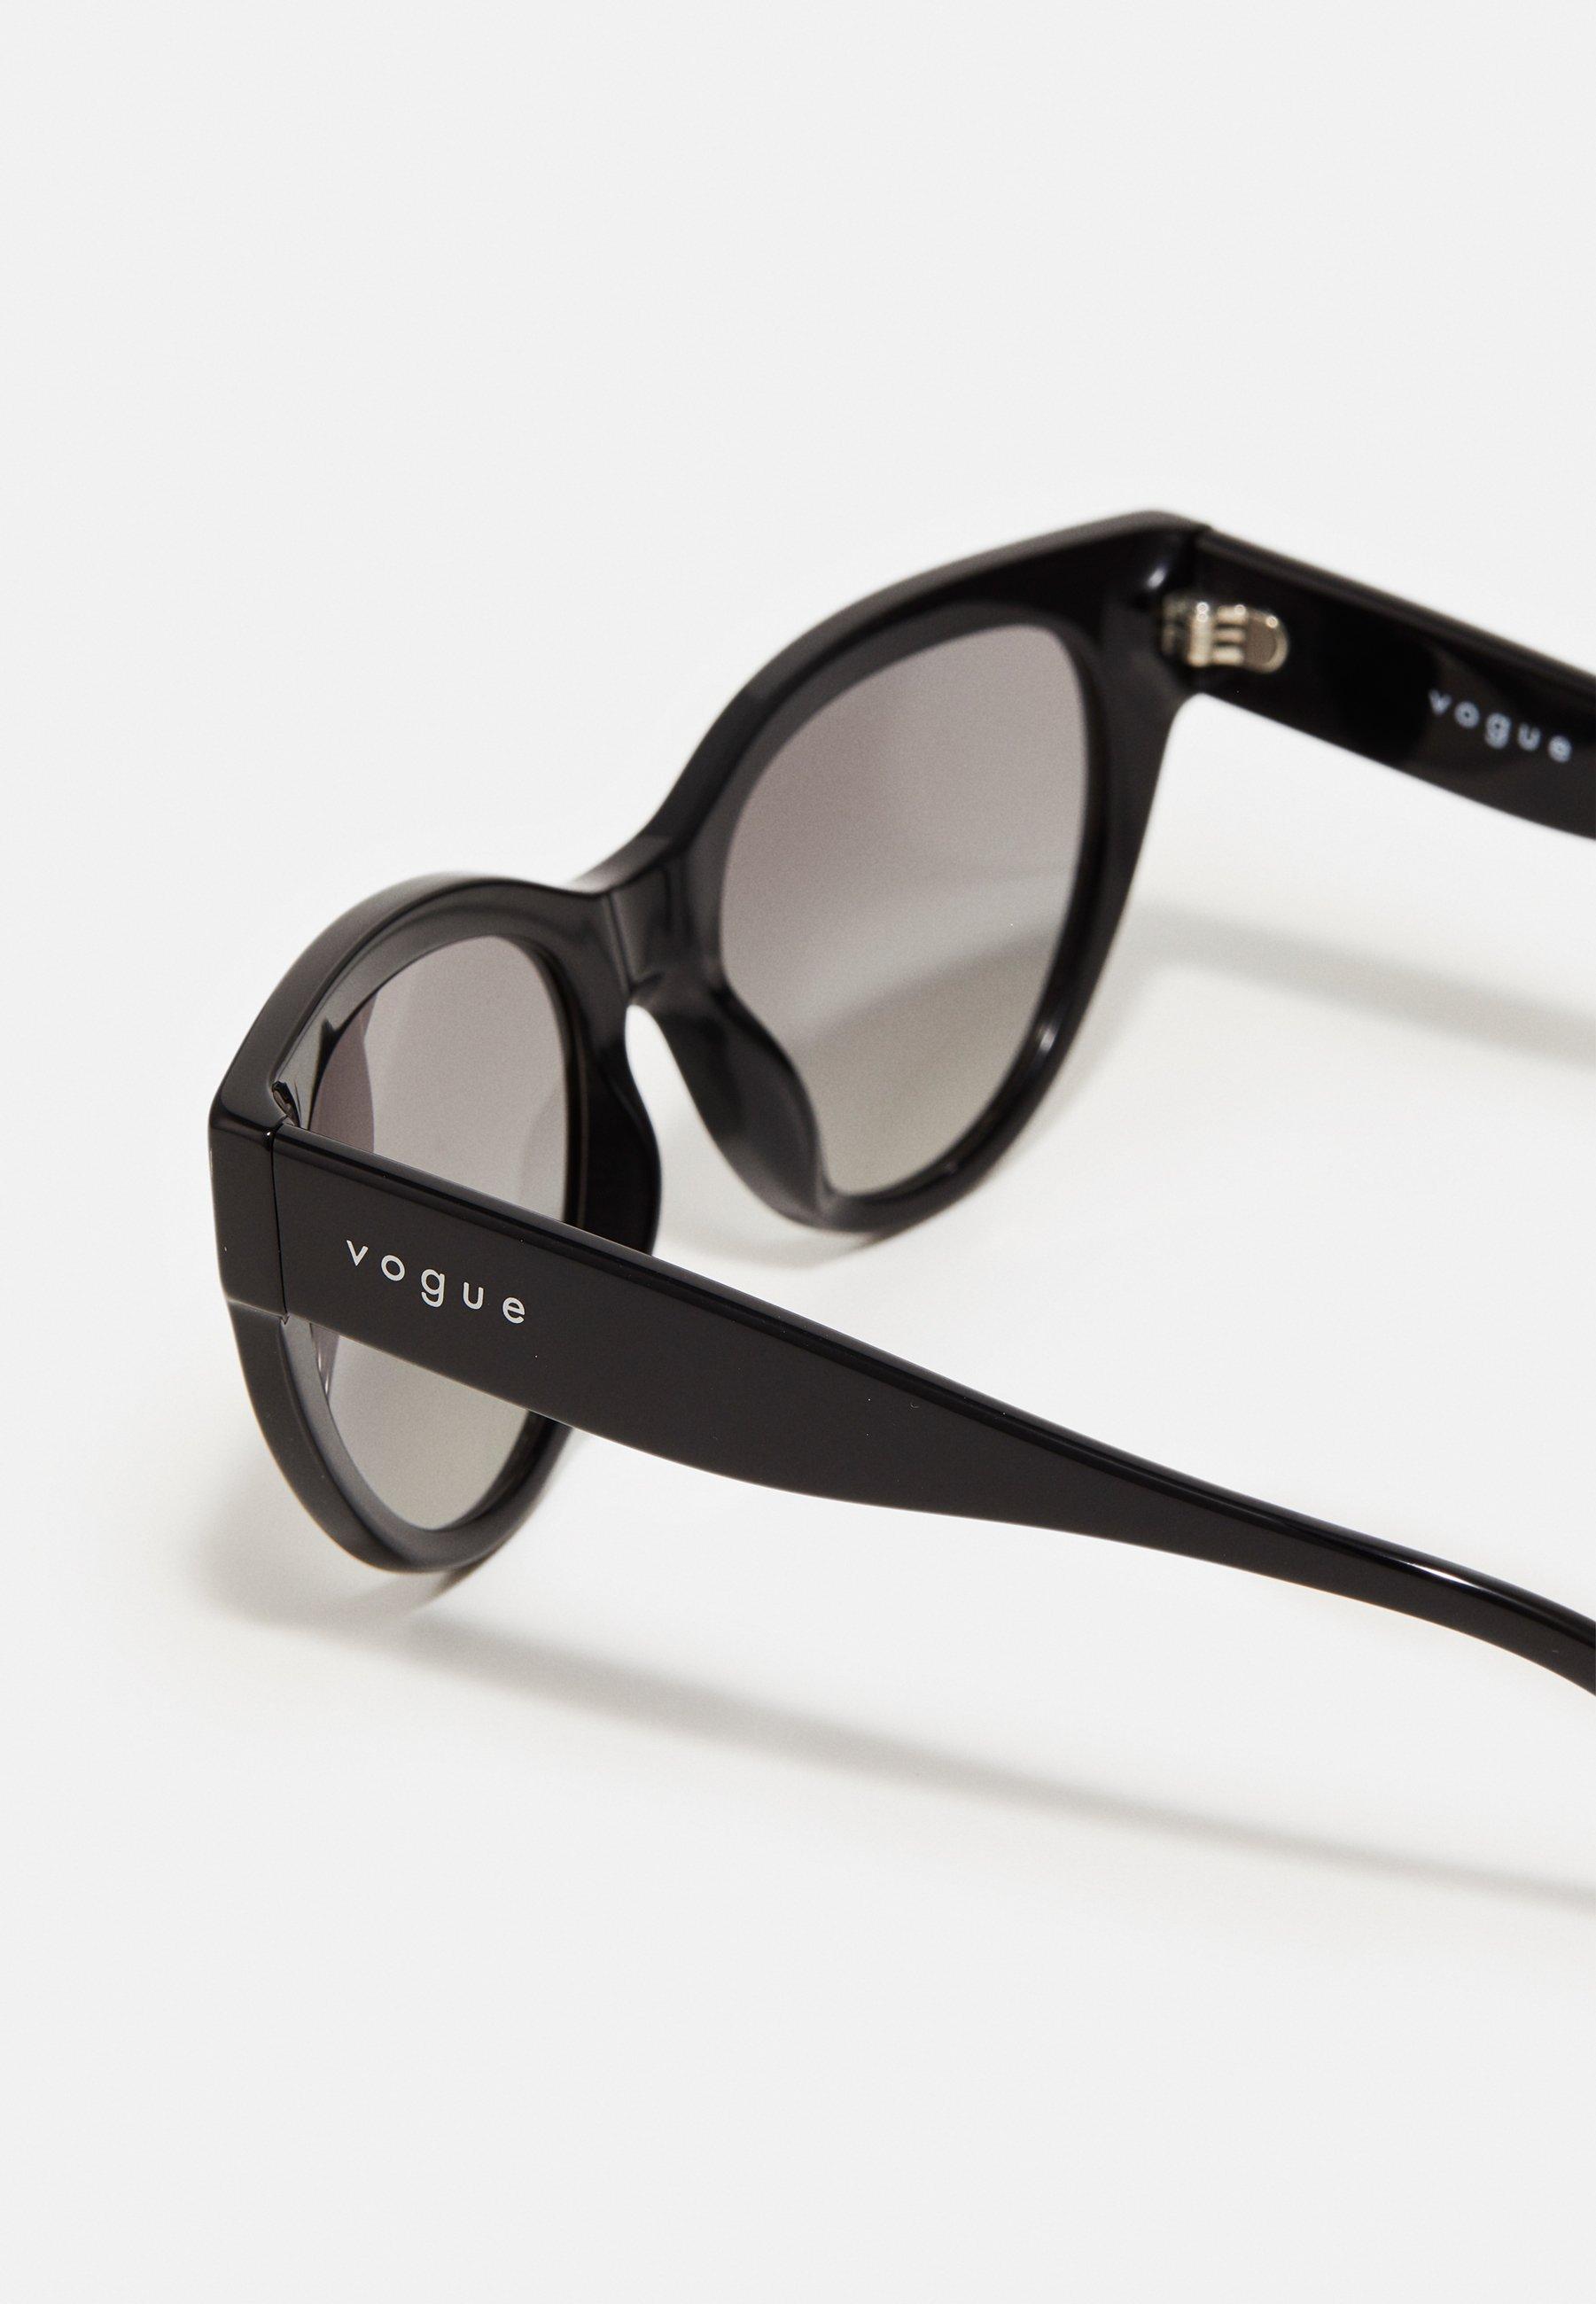 VOGUE Eyewear Solbriller - black/svart KSytInxA9NP3LVP